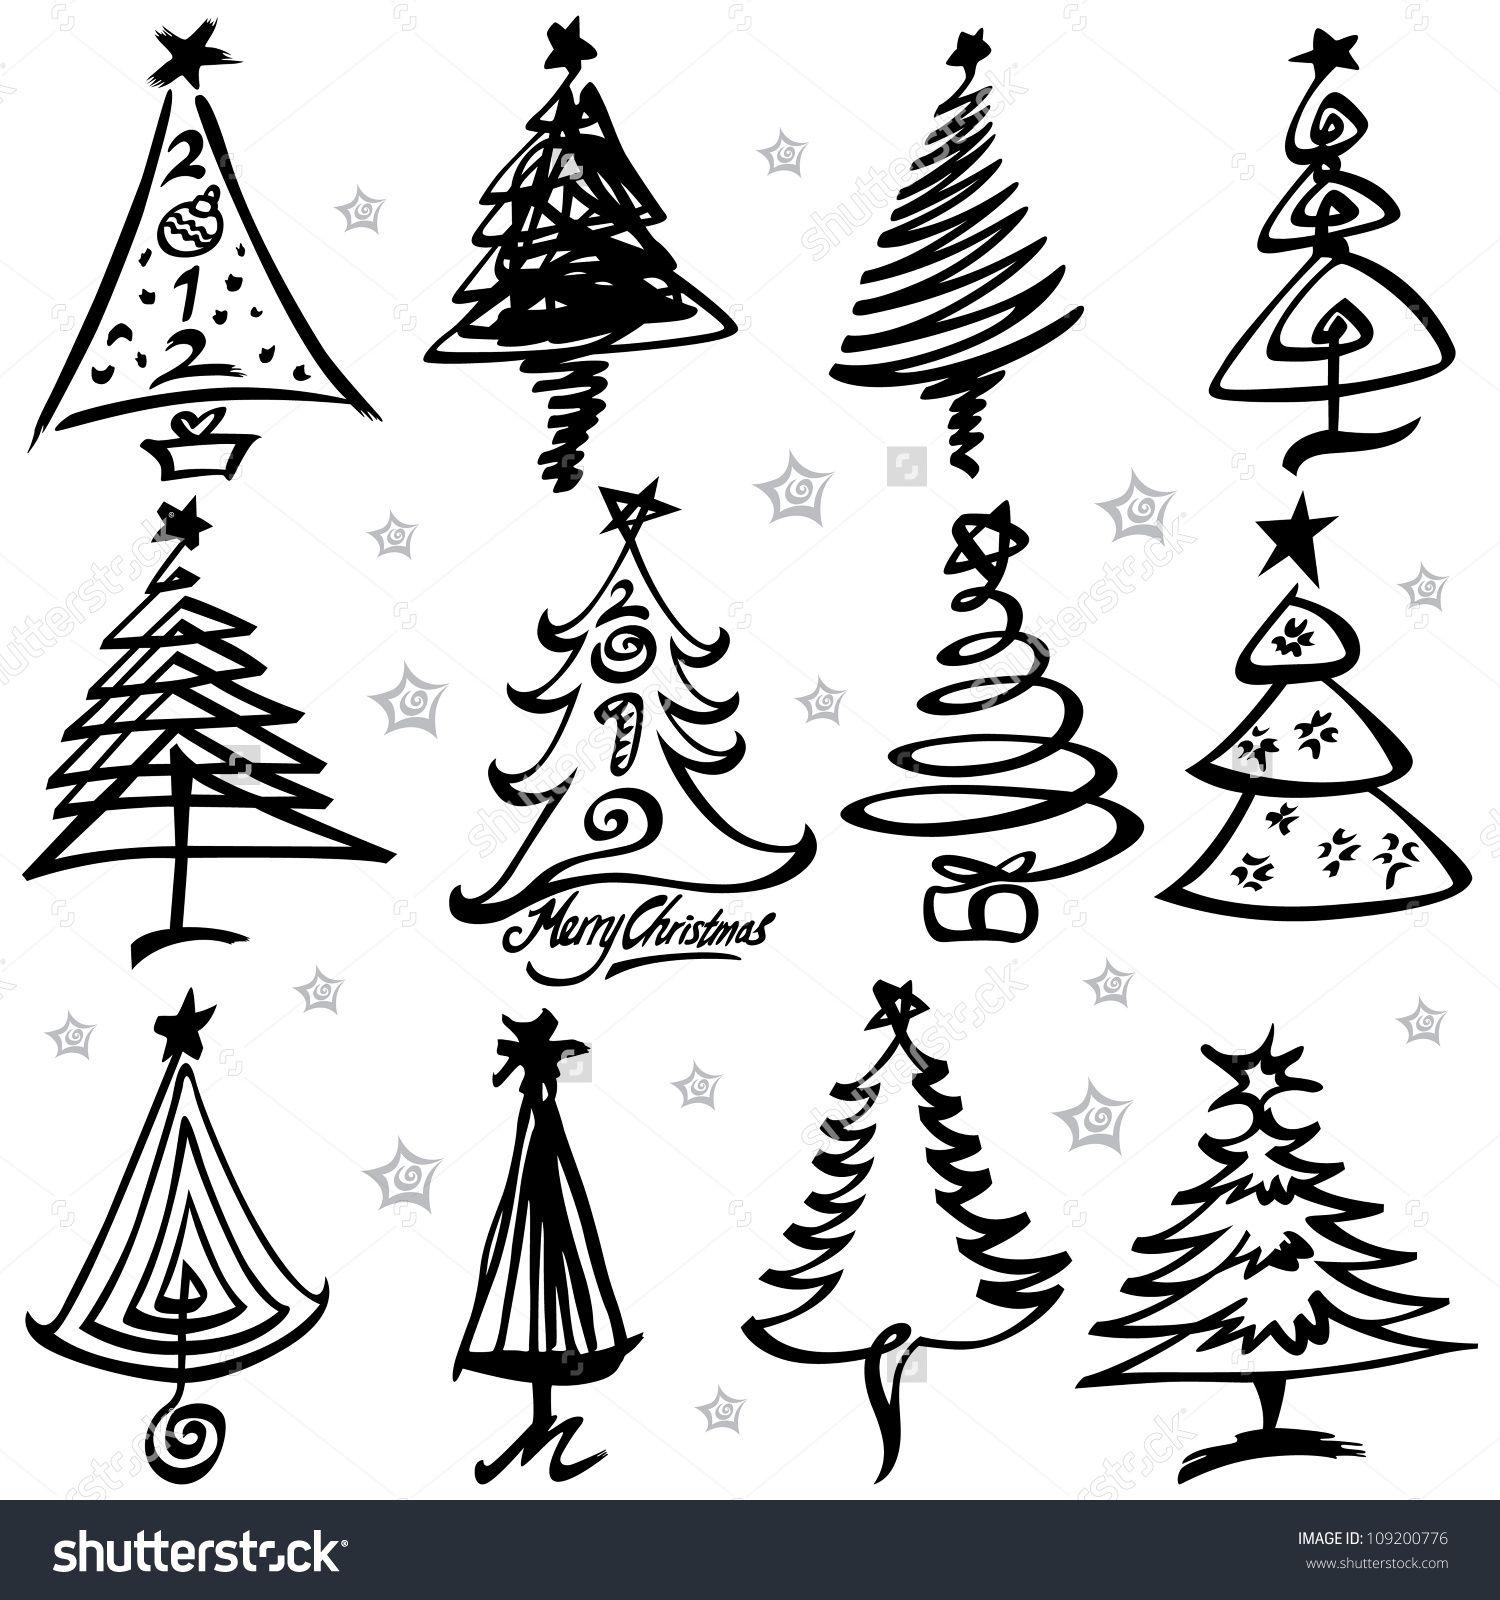 Vector Illustration Of Christmas Tree Design Set